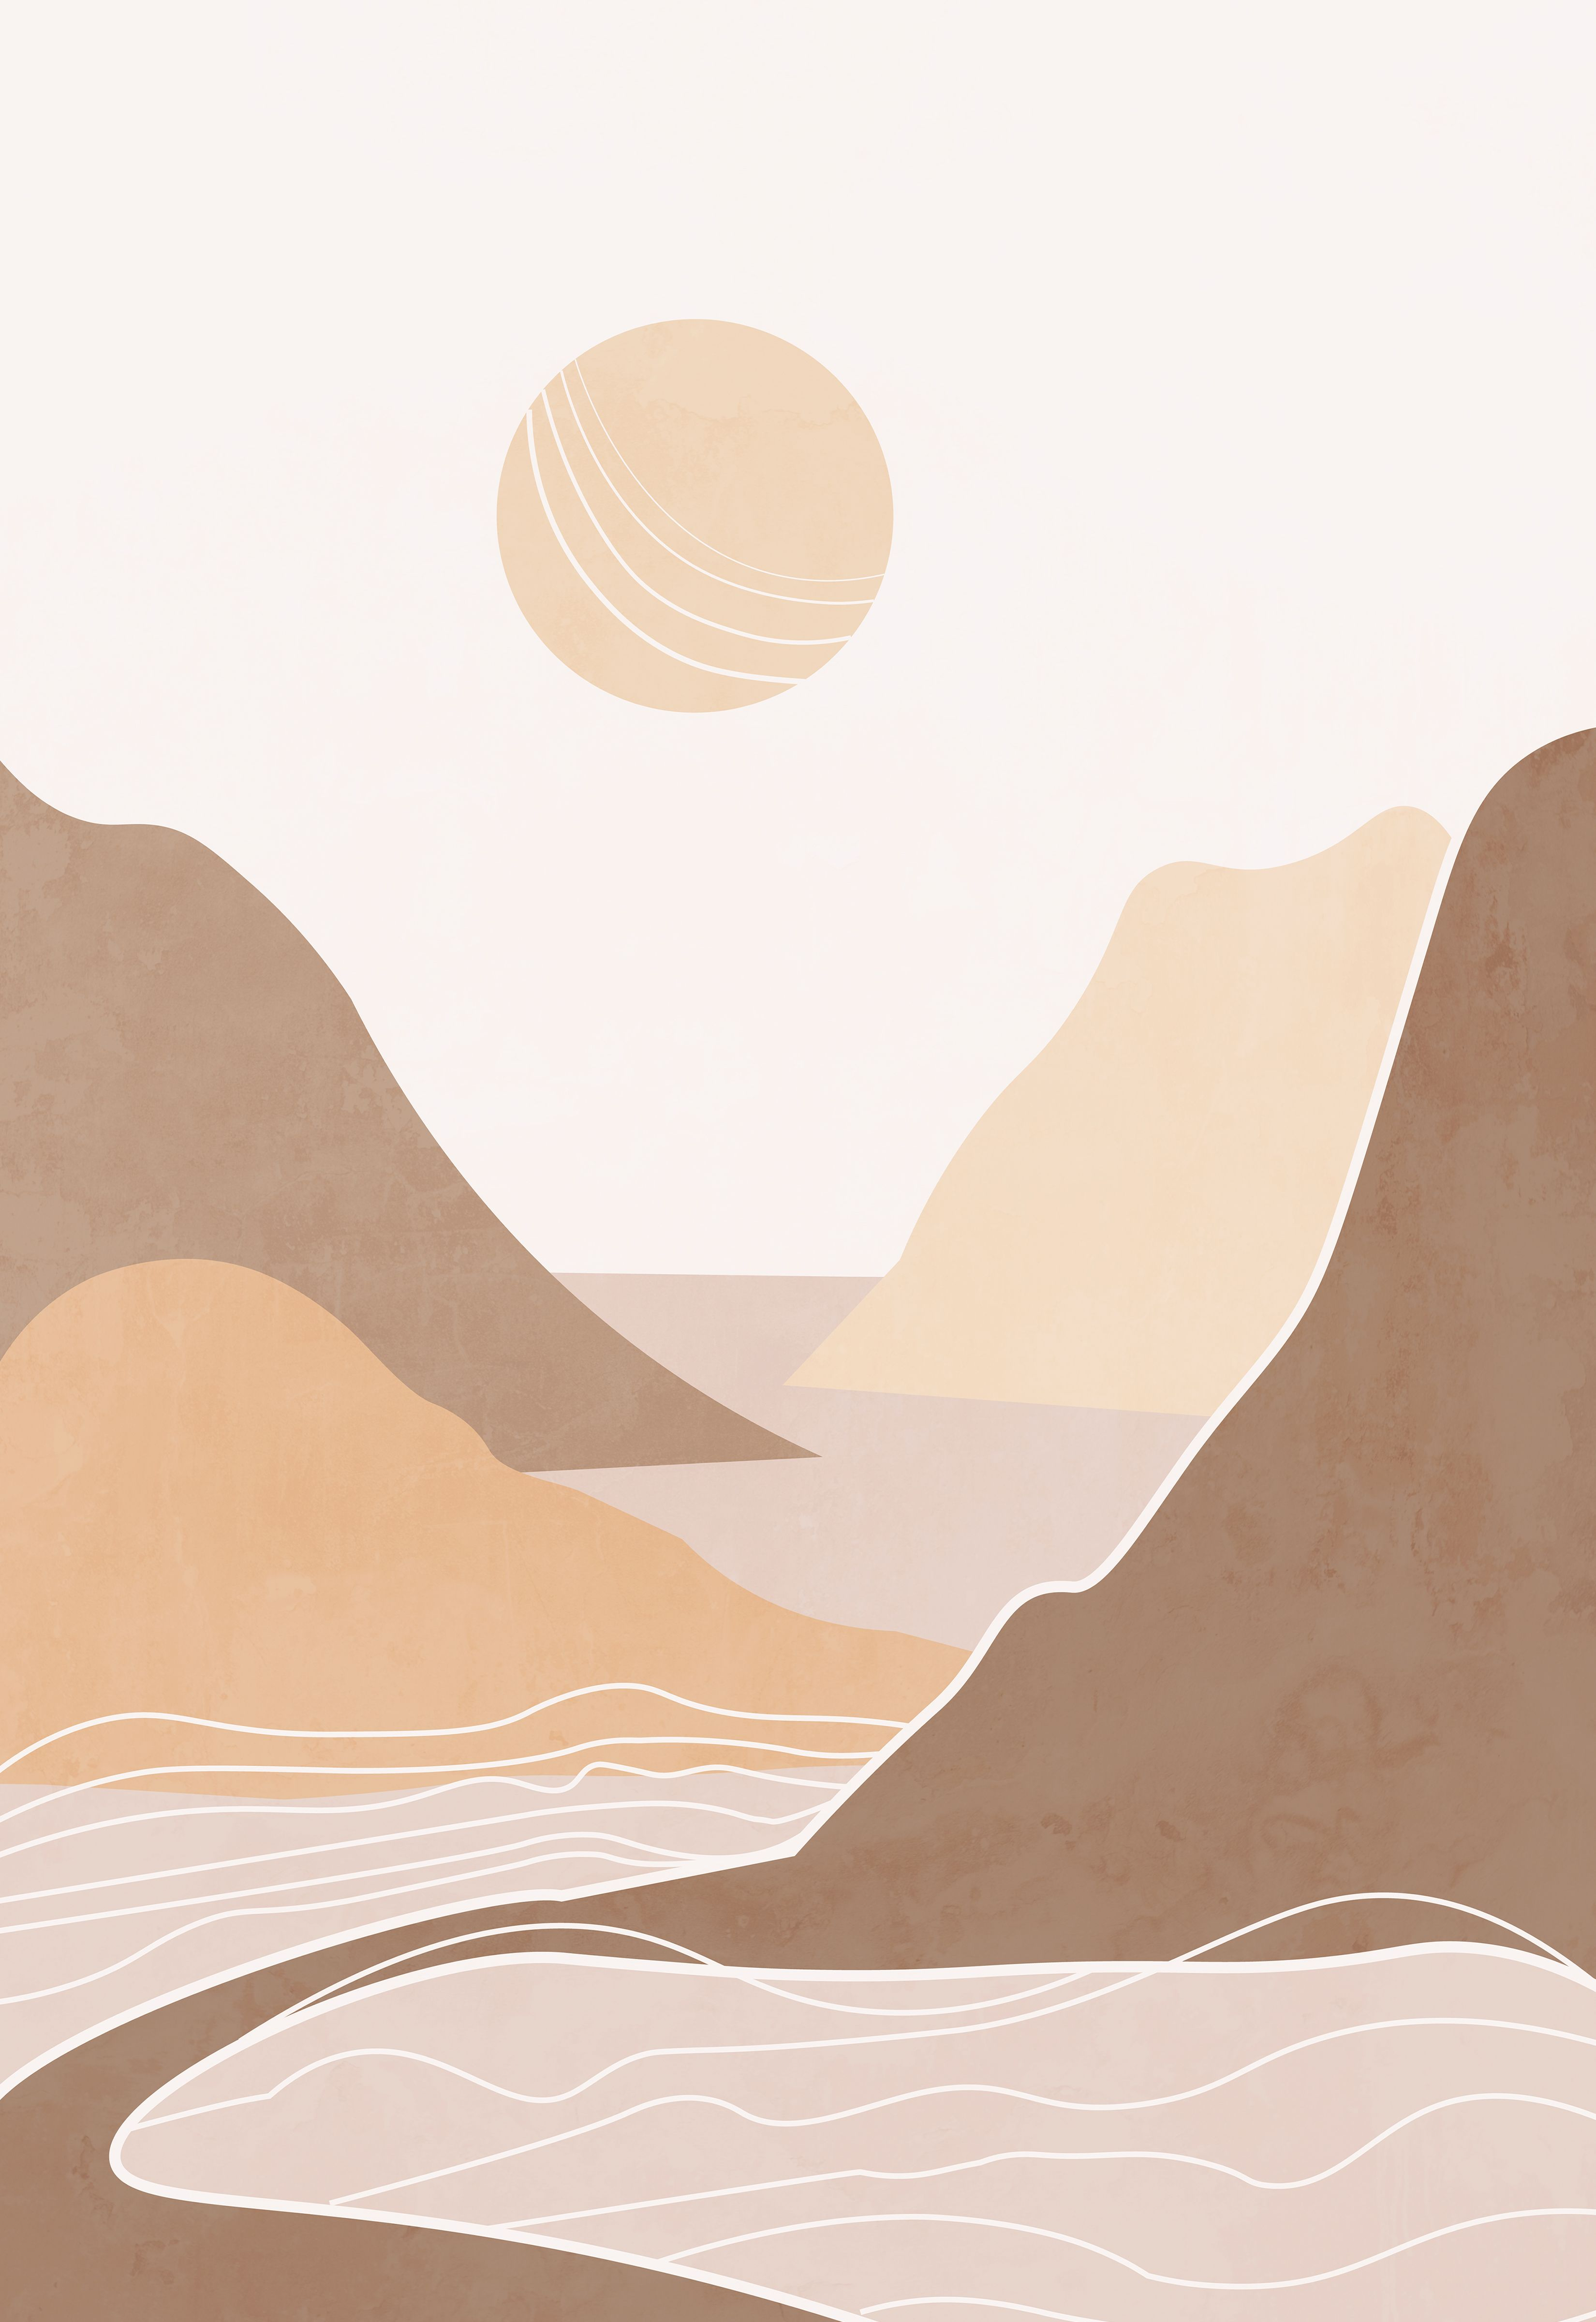 Abstract Landscape Terracotta Bohemian Printable Wall Art Minimalist Wall Art Printable Wall Art Botanical Poster